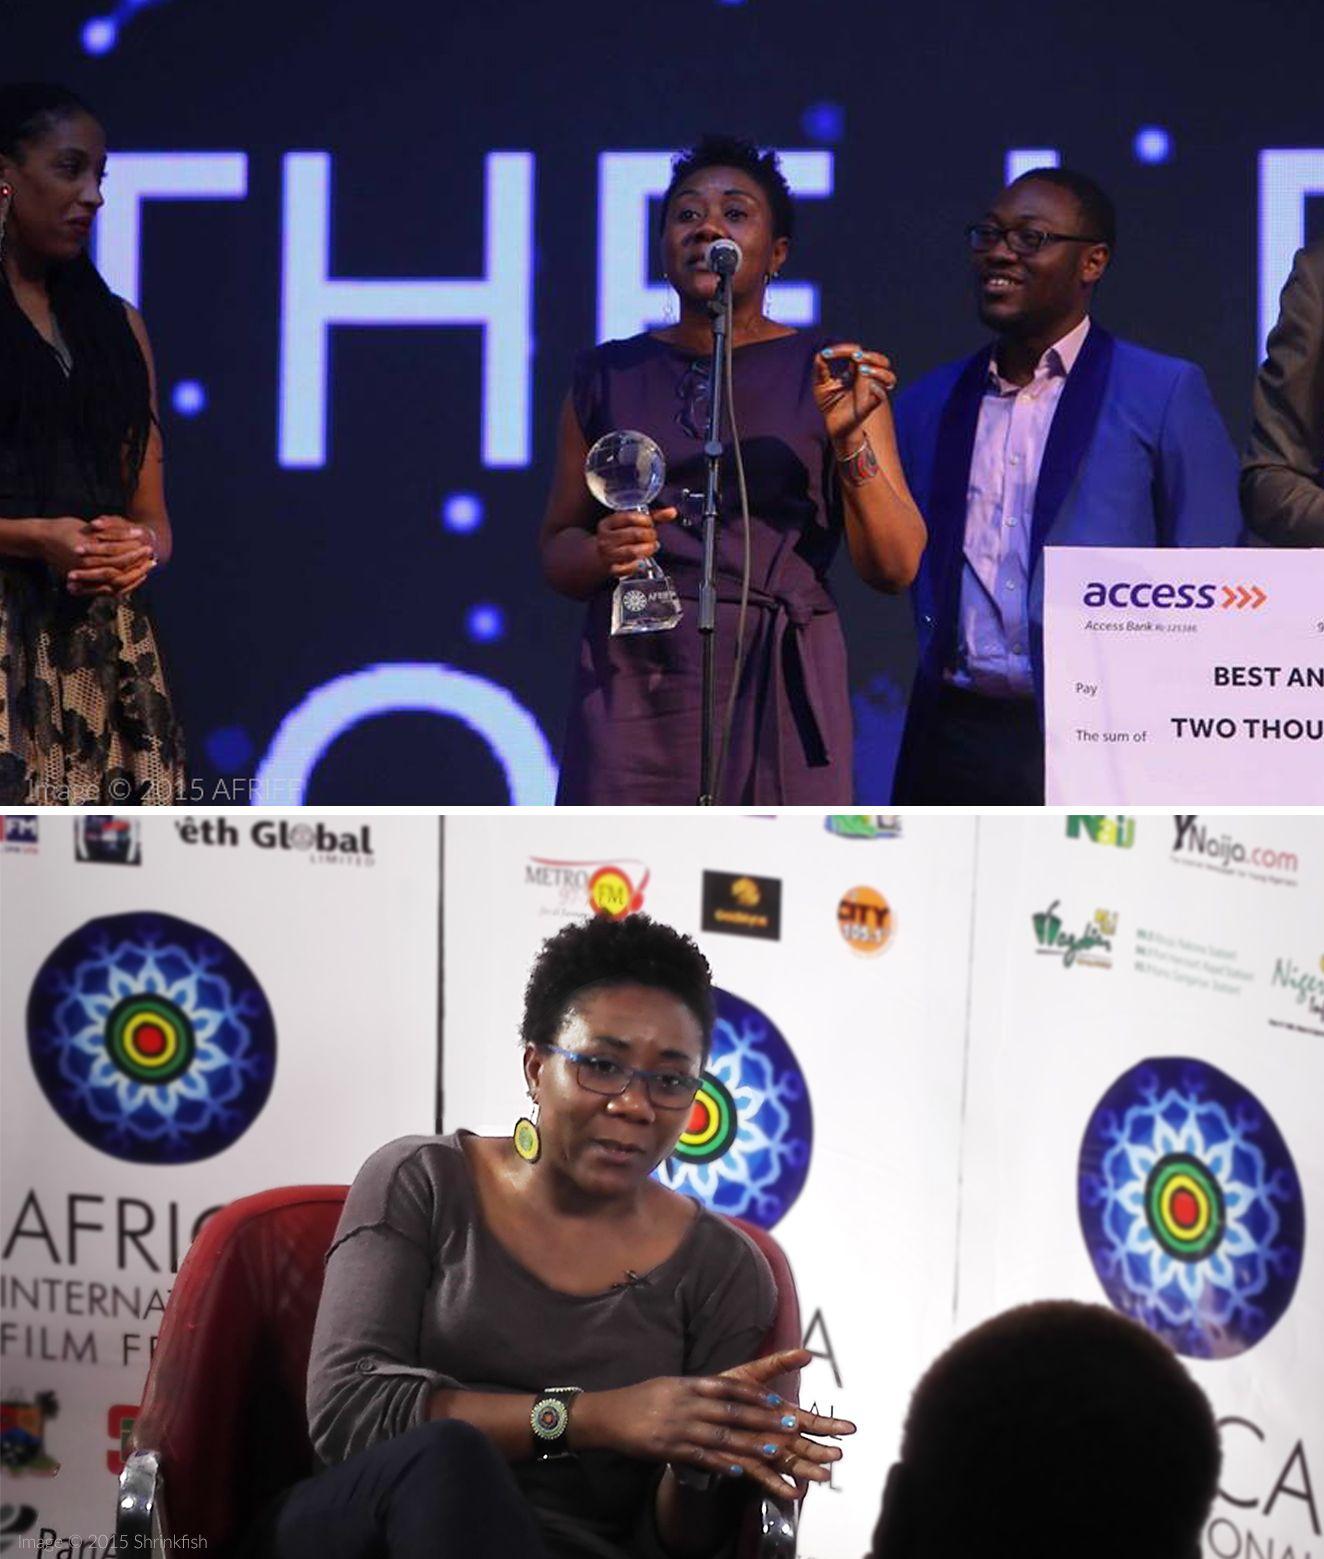 Ebele Okoye 2015 Africa International Film Festival / image ©AFRIFF+ Shrinkfish